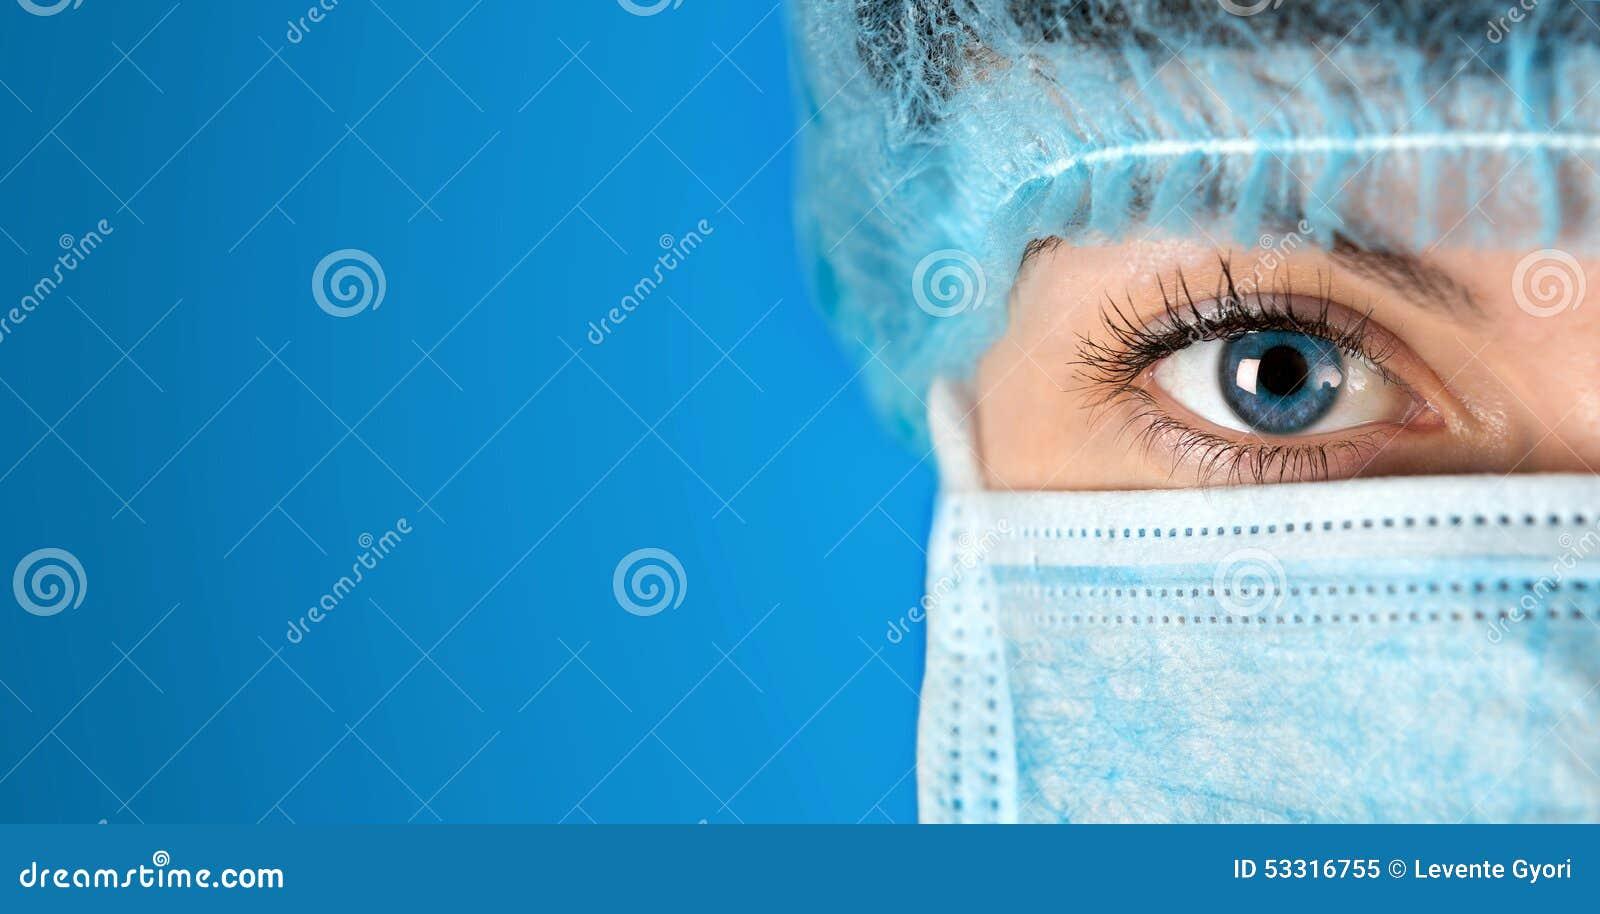 Surgeon gazing hospital close up shot